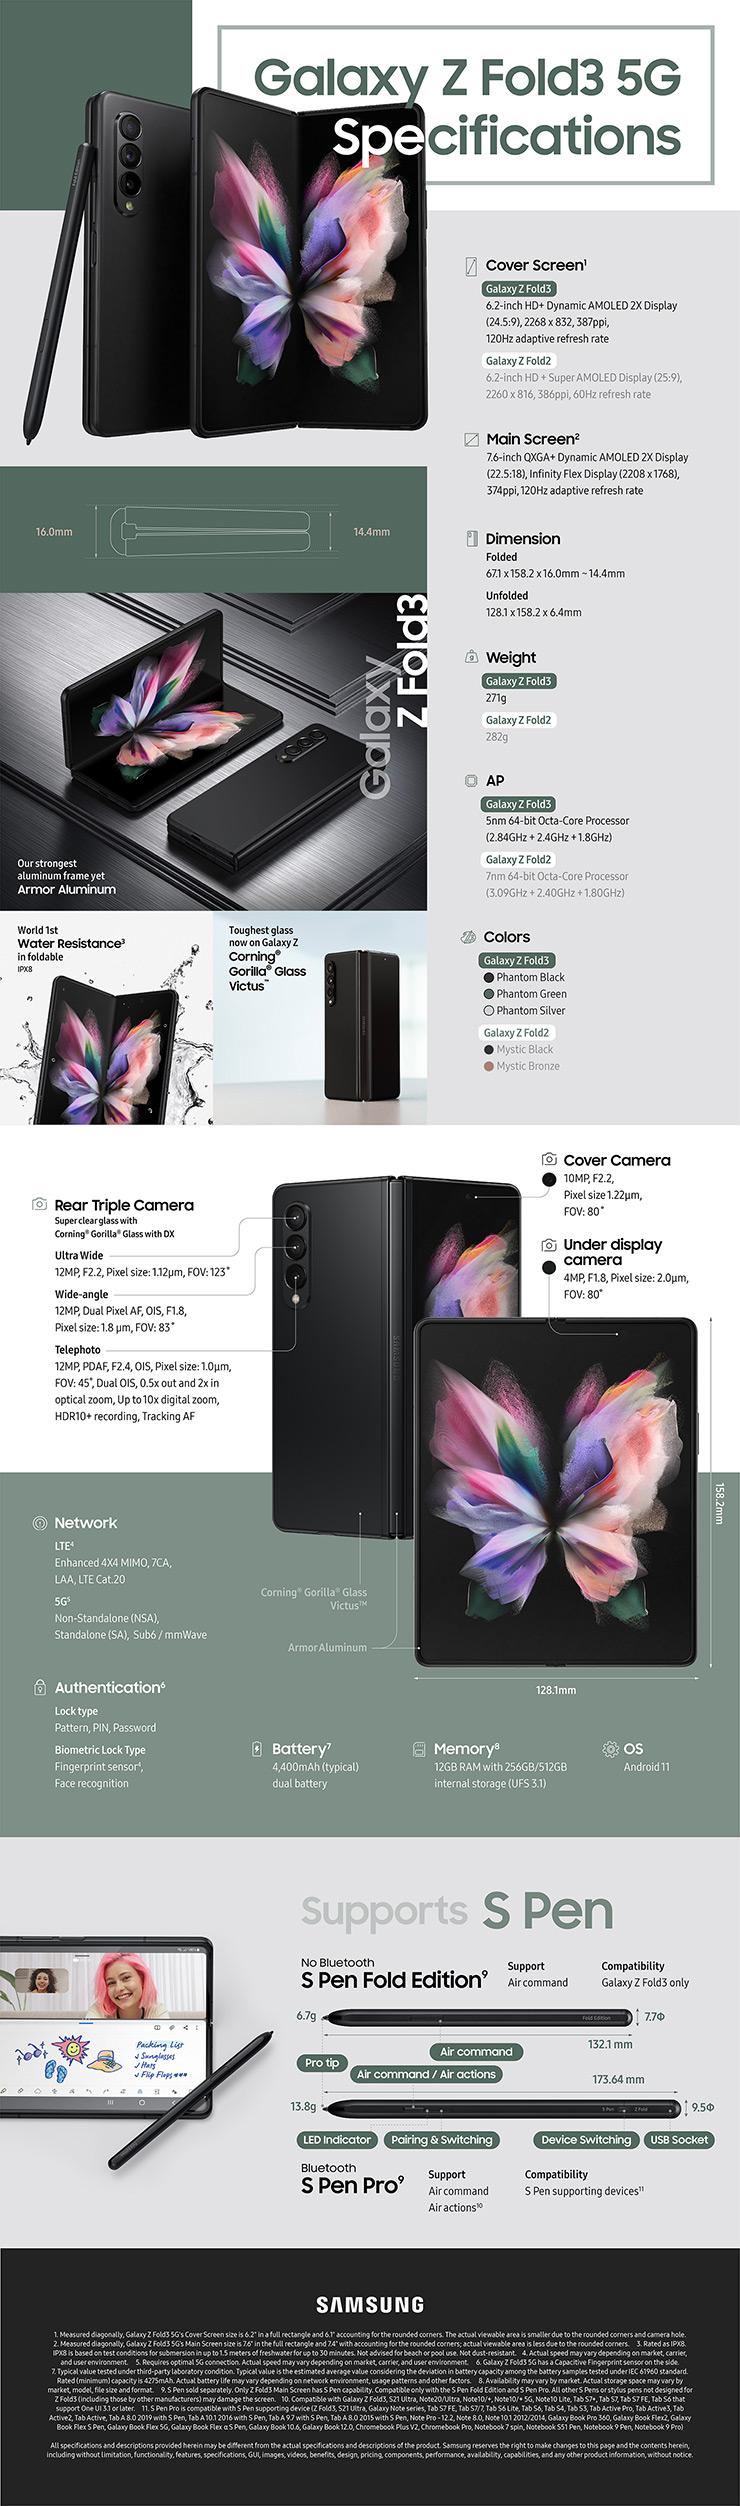 Samsung Galaxy Z Fold3 infographic